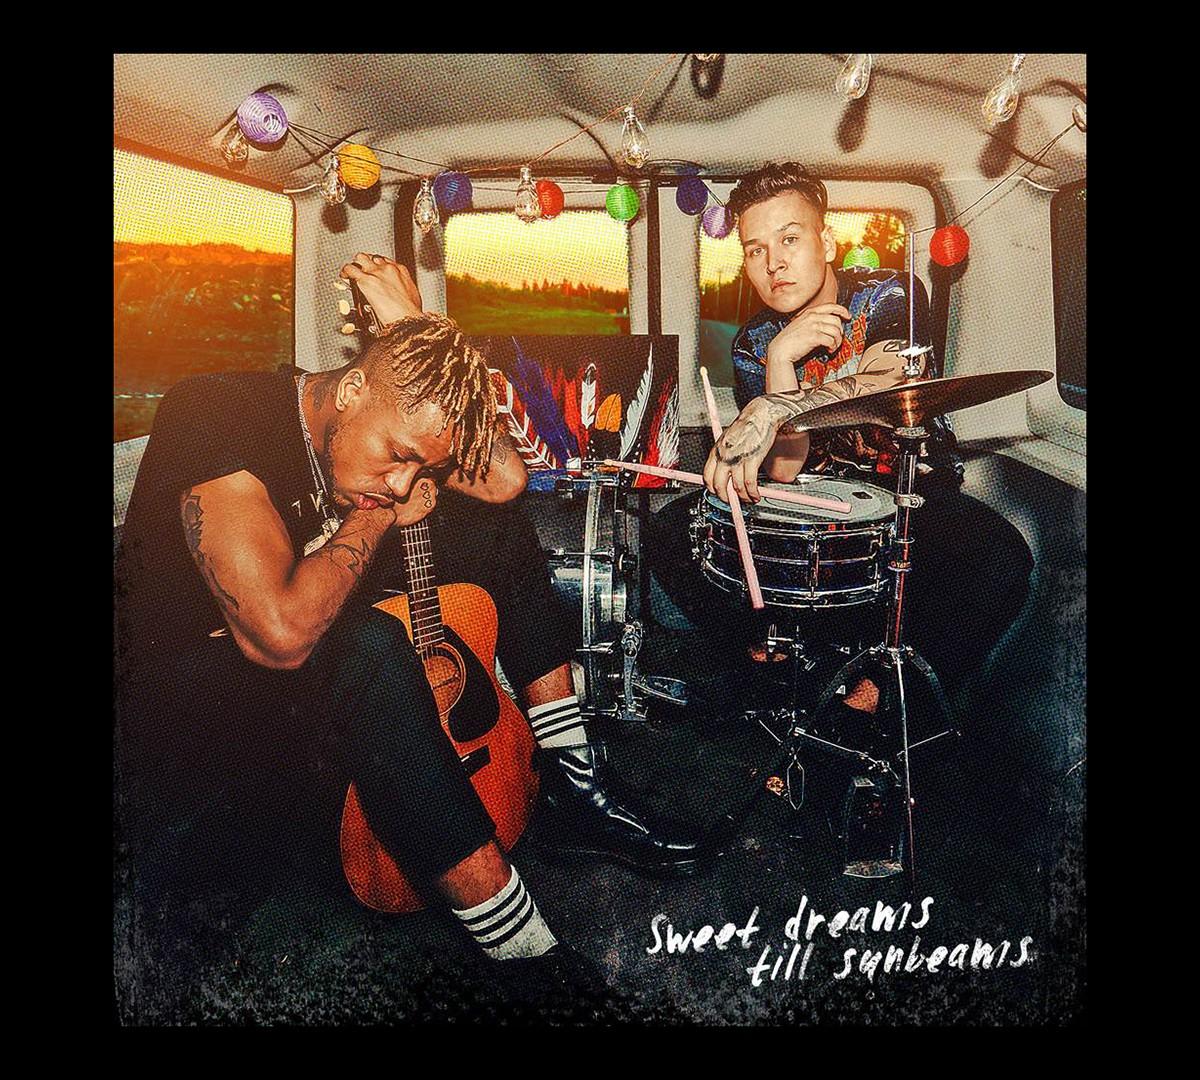 Neon Dreams Release Debut Album – Sweet Dreams till Sunbeams – On July 25th